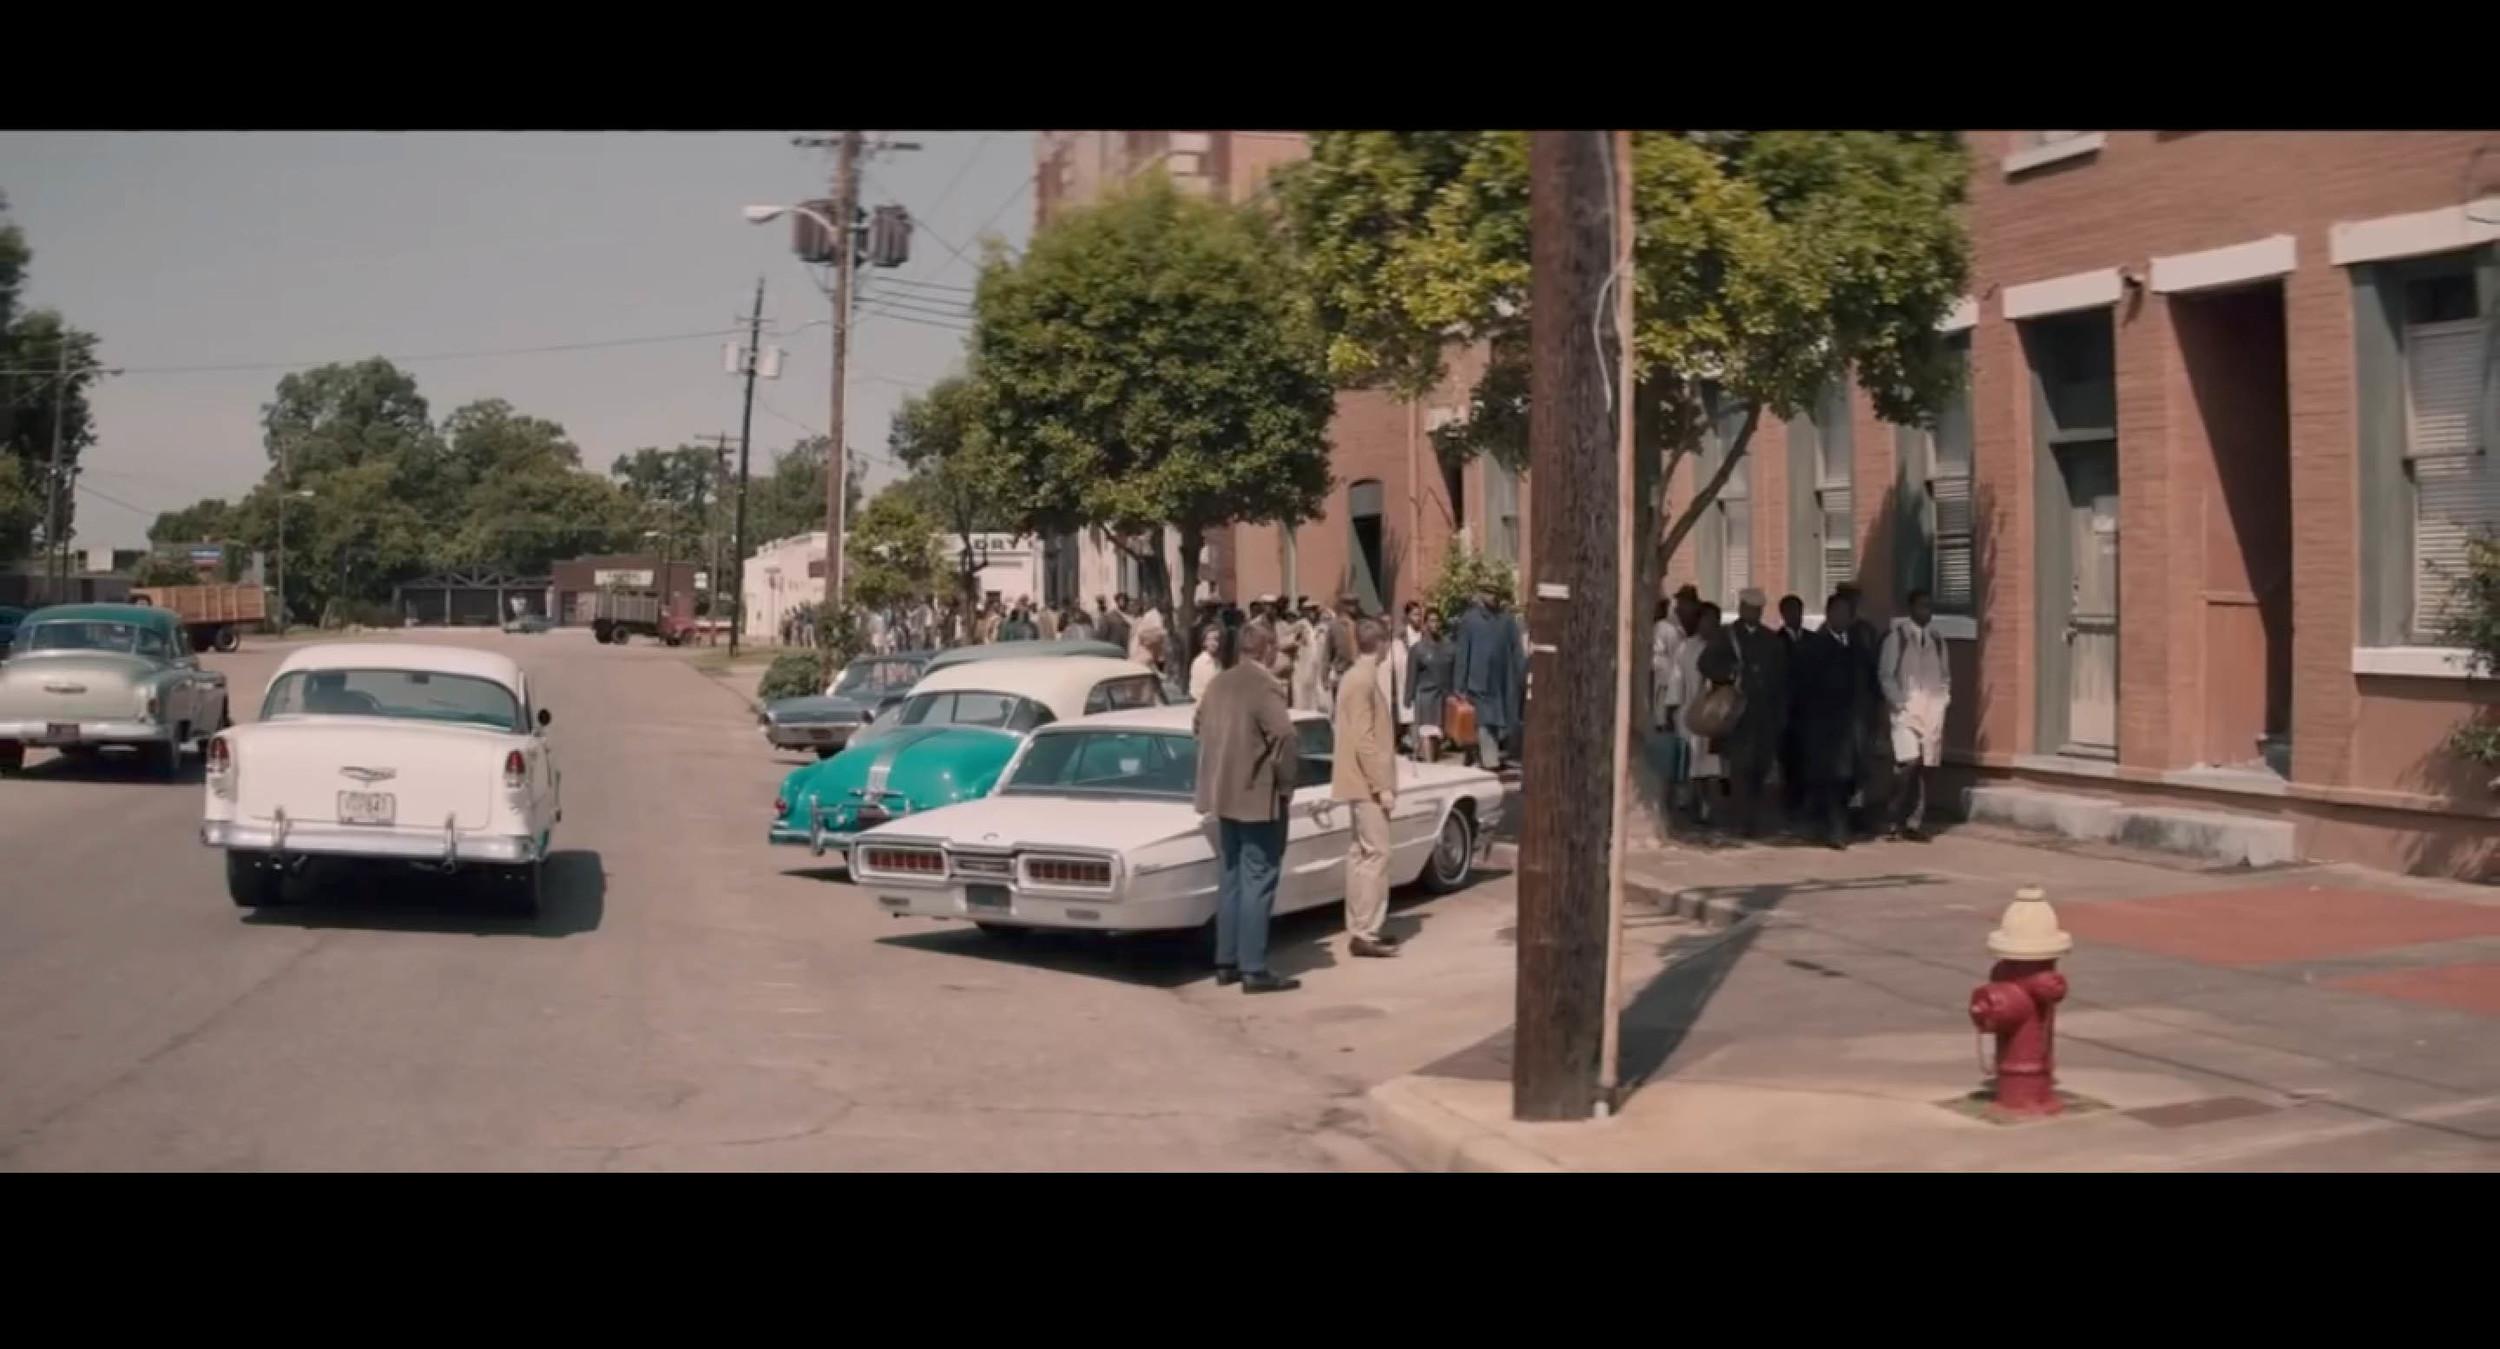 Screenshotof  Selma  - though the actual film location might be around  Georgia's Marietta Square.